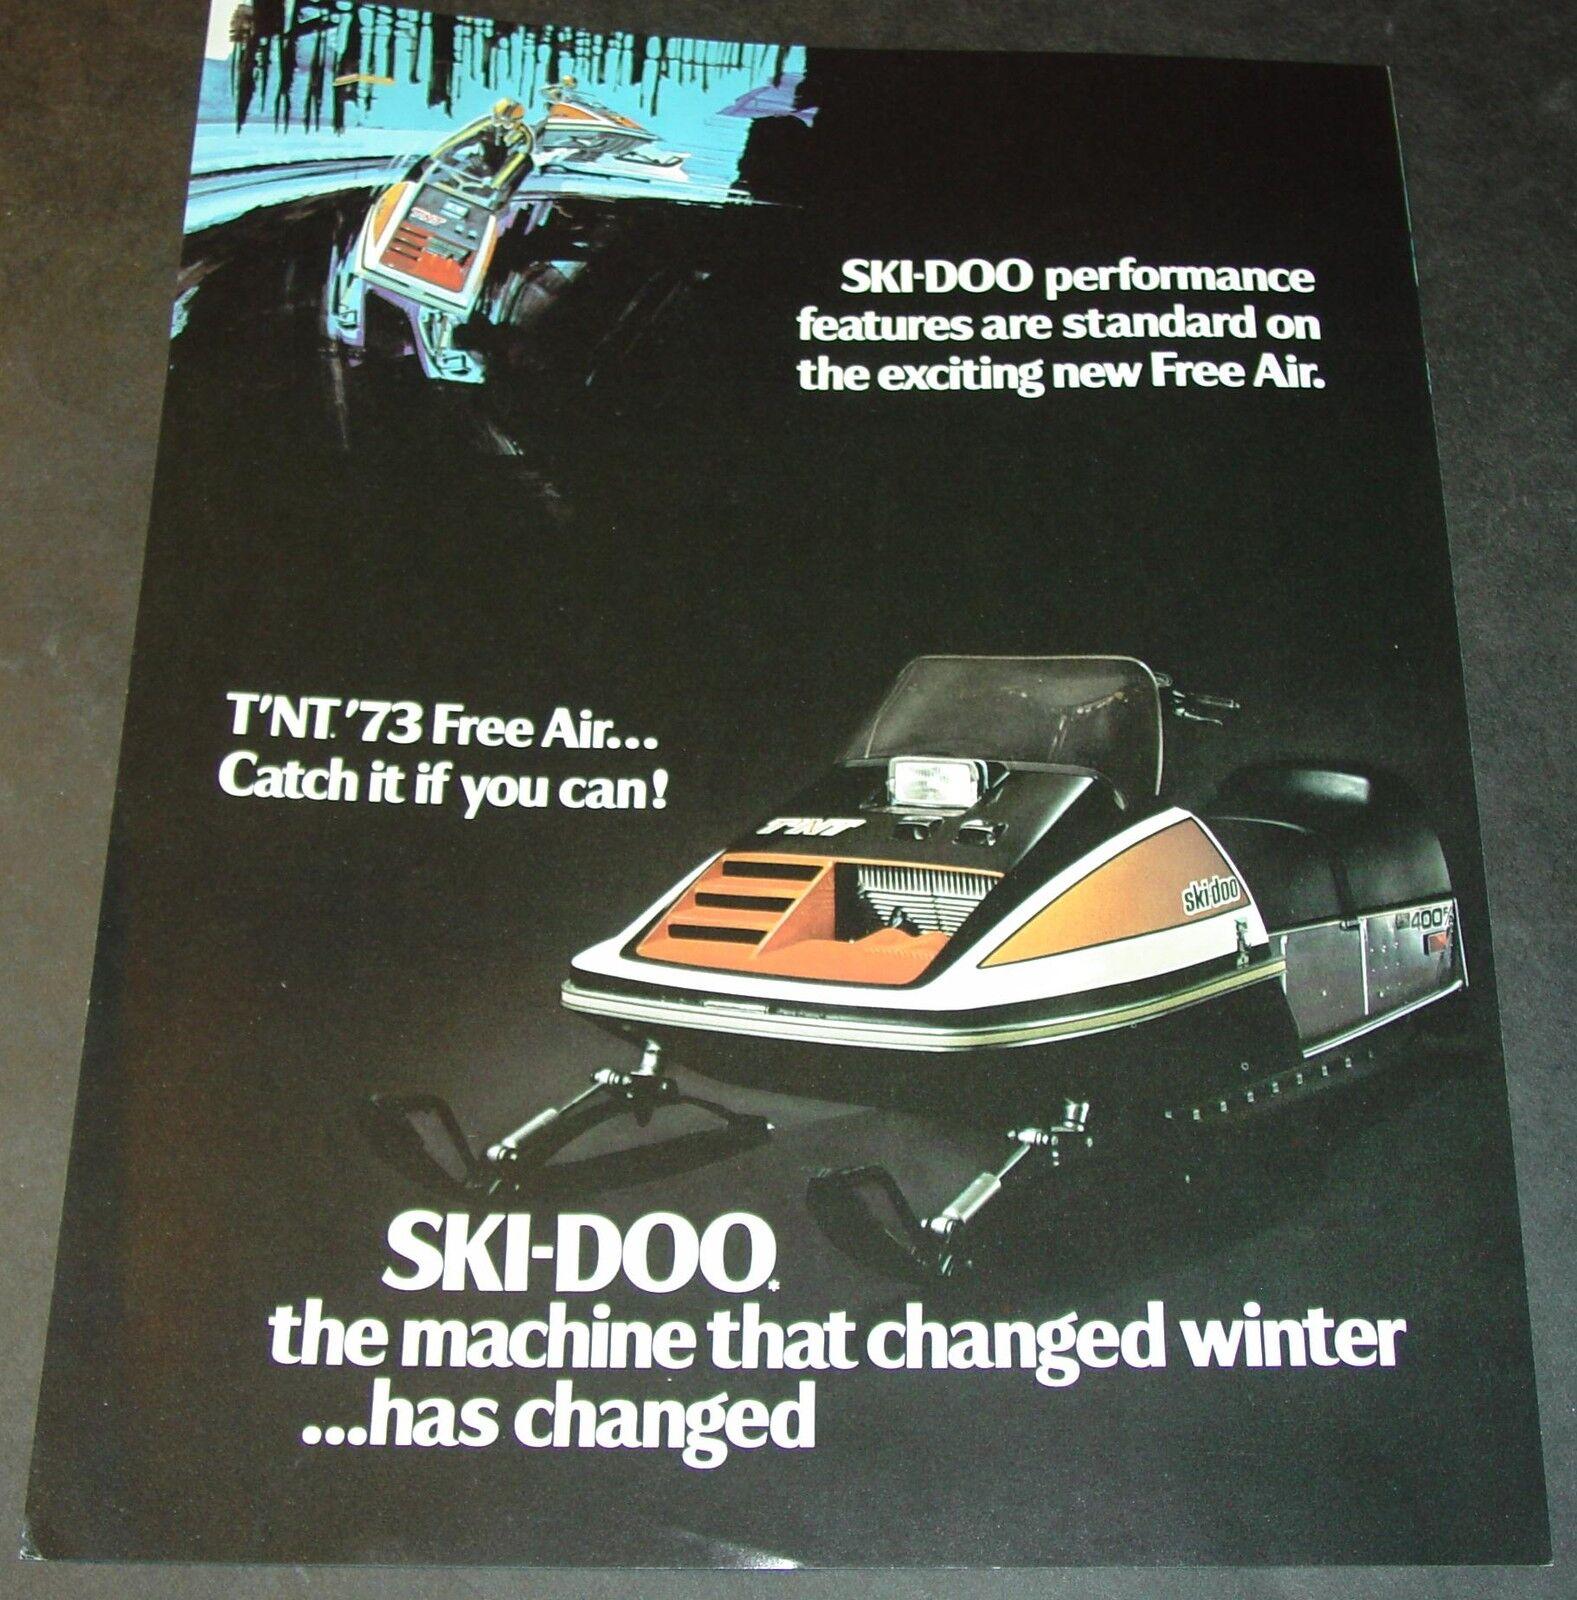 RARE 1973 1973 1973 SKI-DOO T'NT FREE AIR SNOWMOBILE SALES BROCHURE d4624b